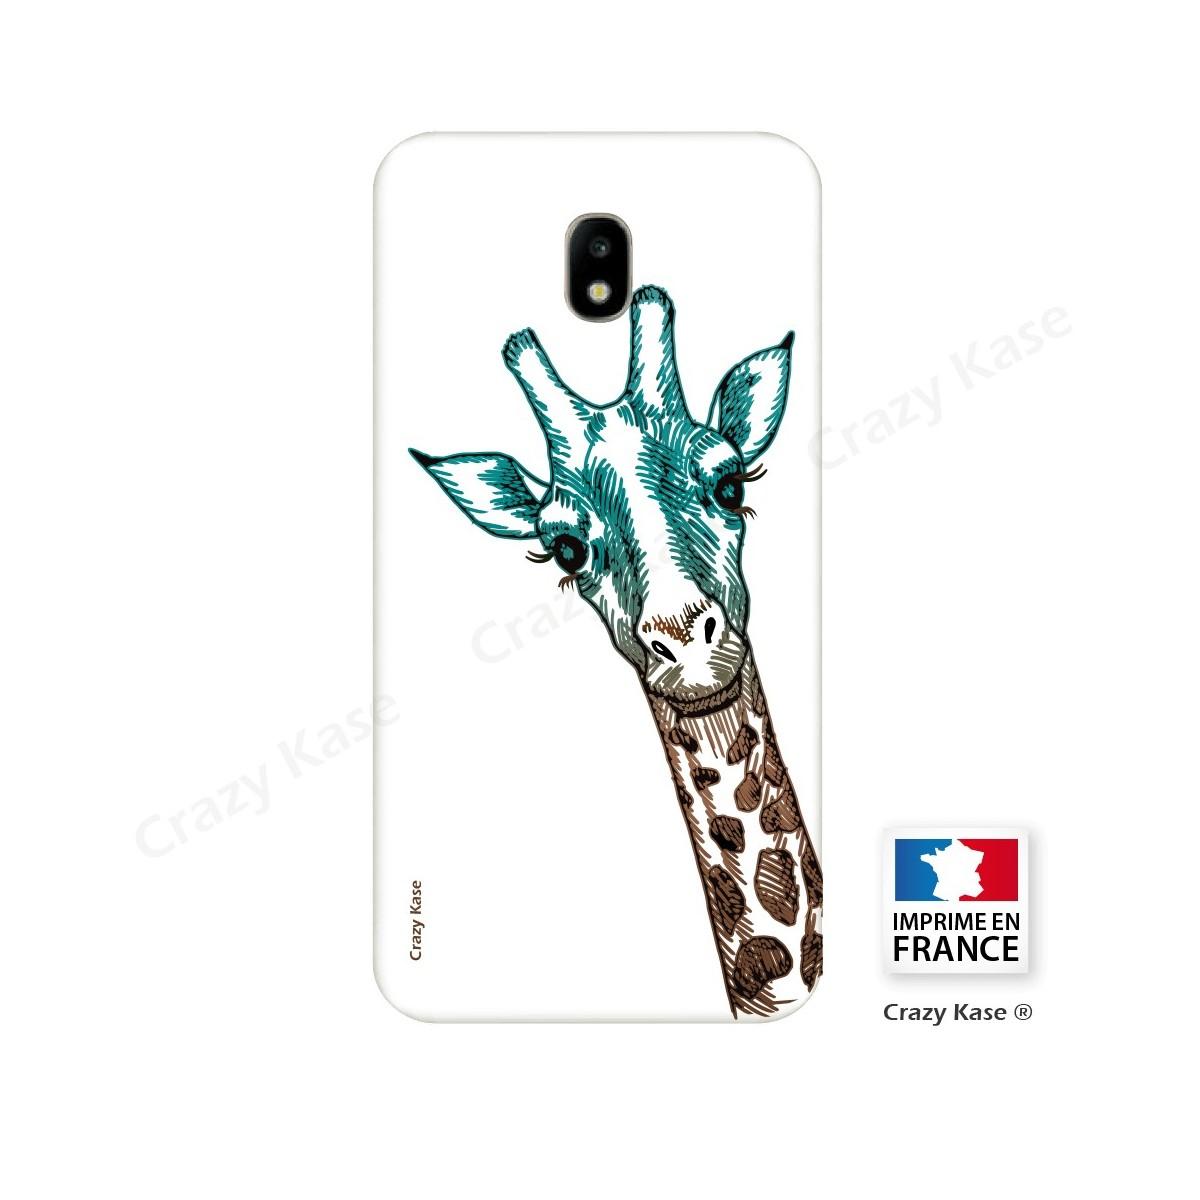 Coque Galaxy J5 (2017) souple motif Tête de Girafe sur fond blanc - Crazy Kase